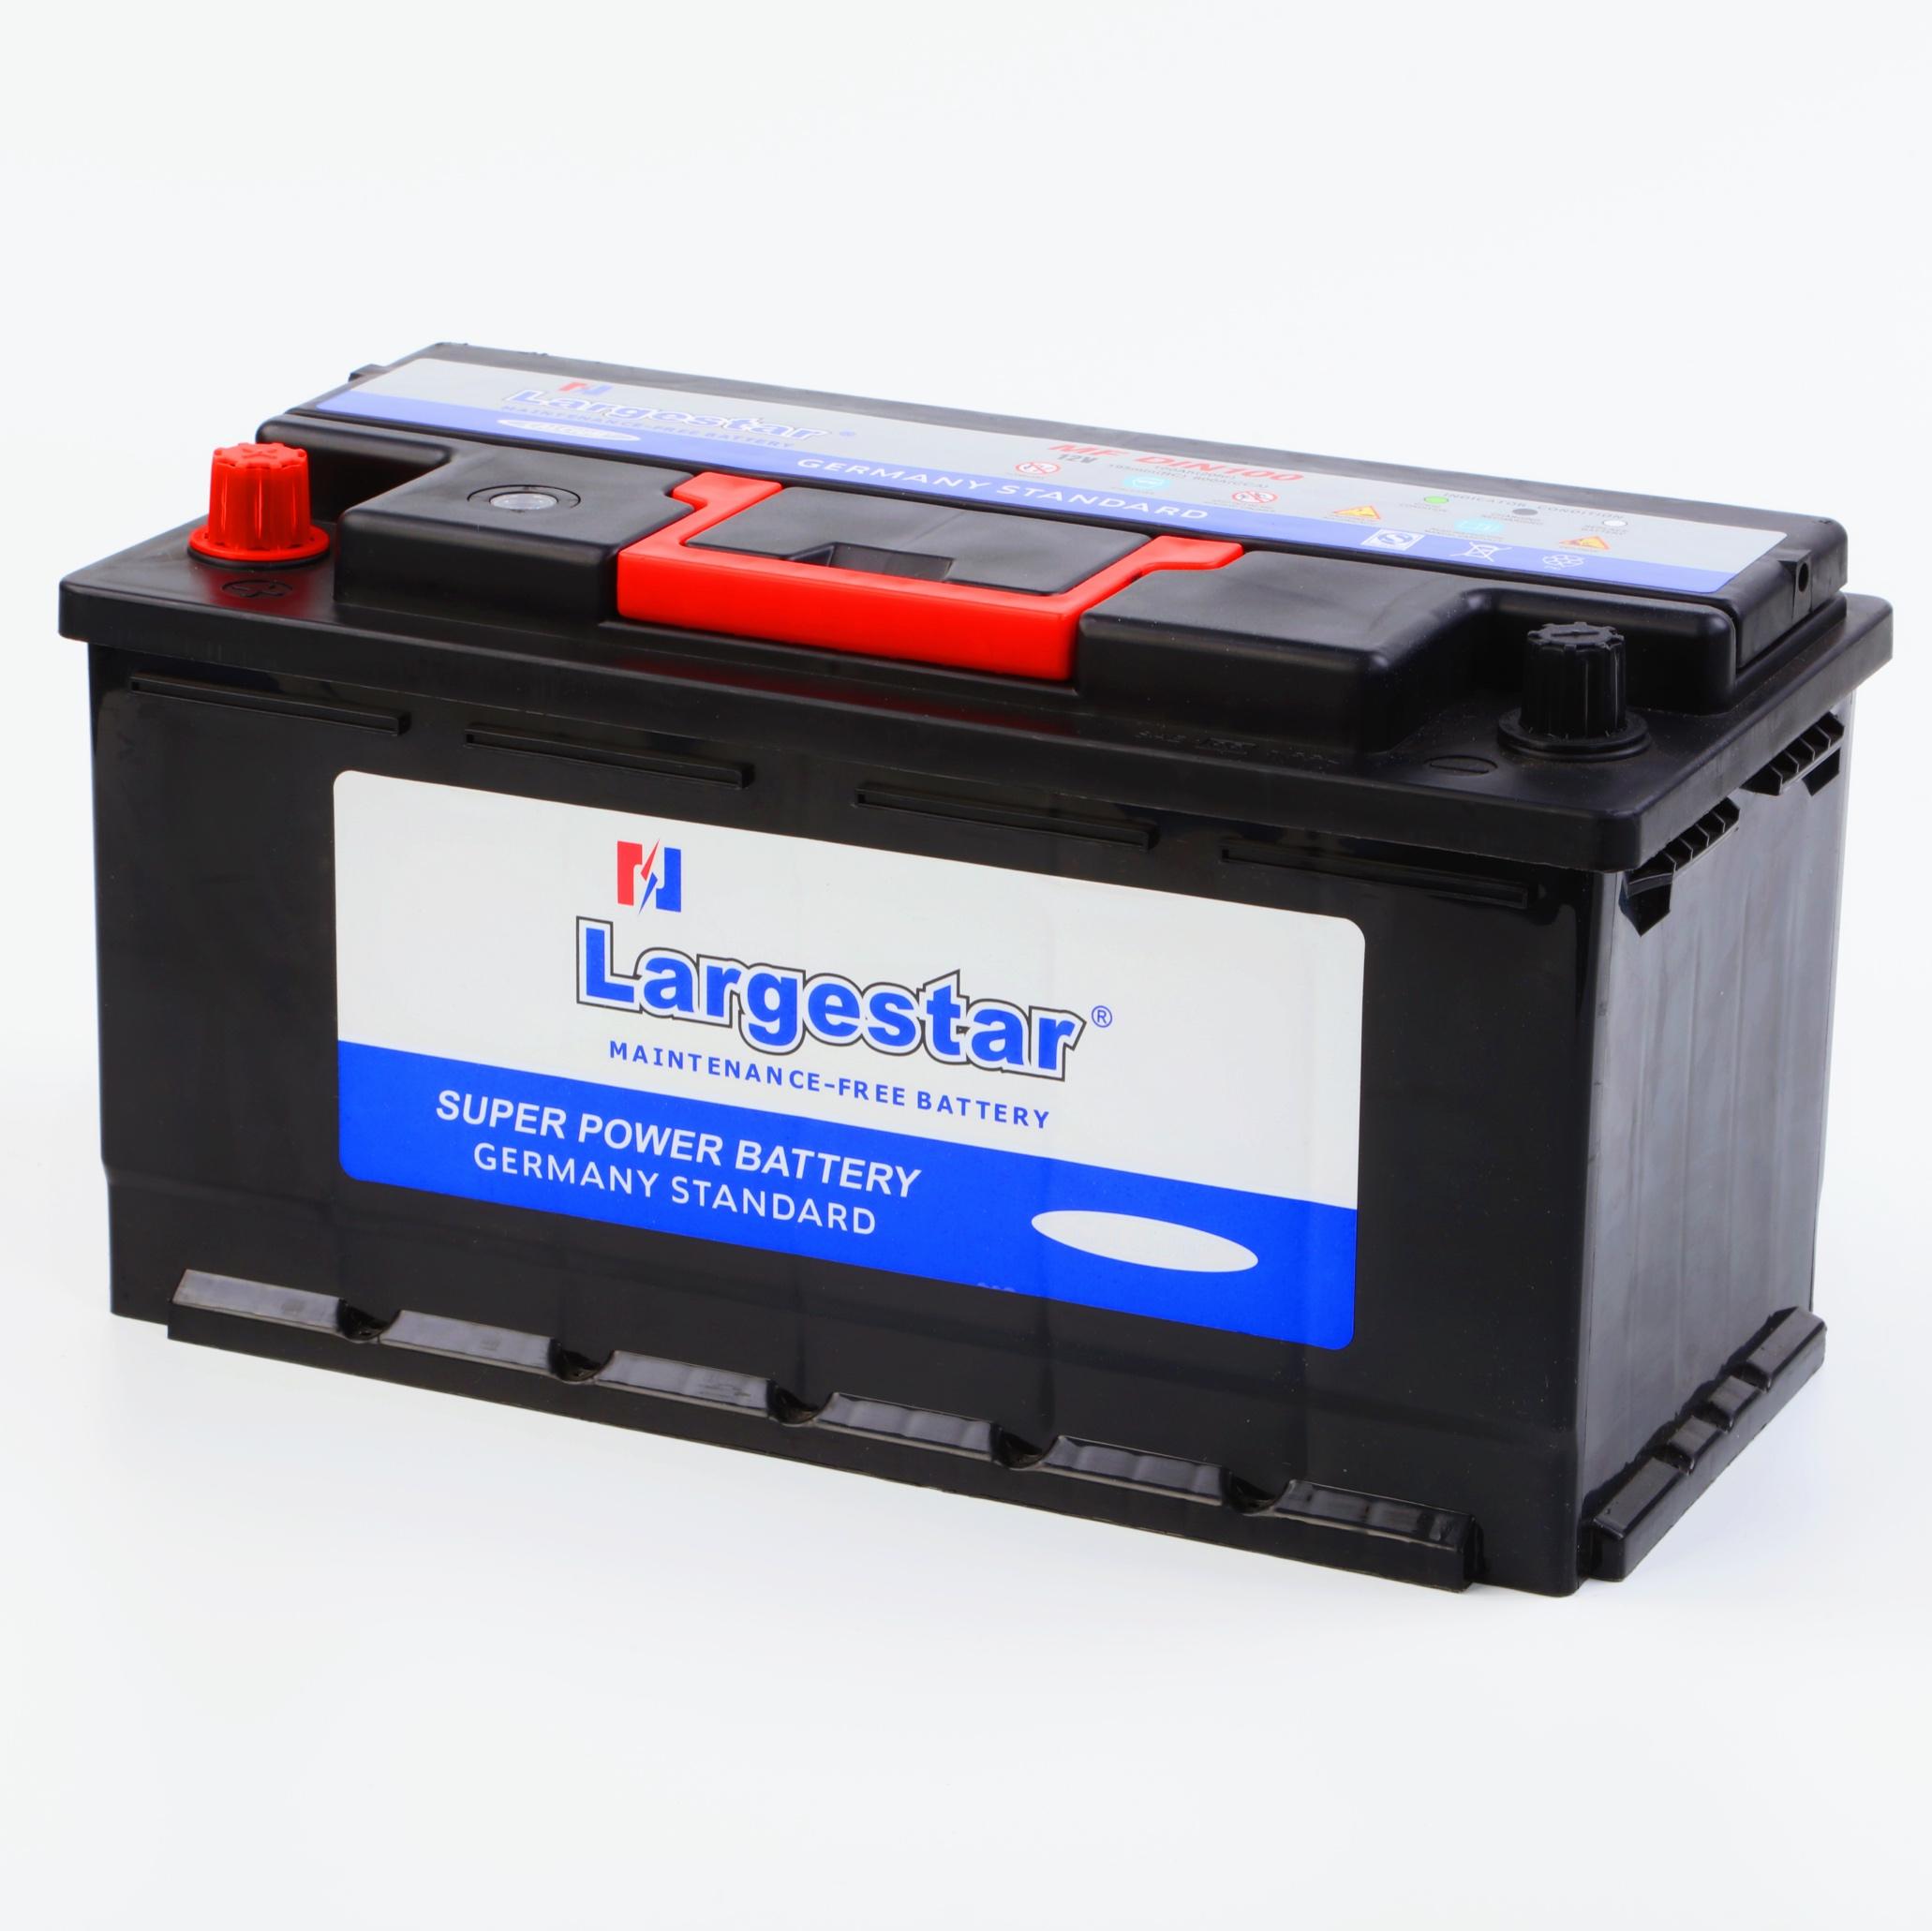 MFDIN100/60038 12V 100Ah Maintenance-free Battery